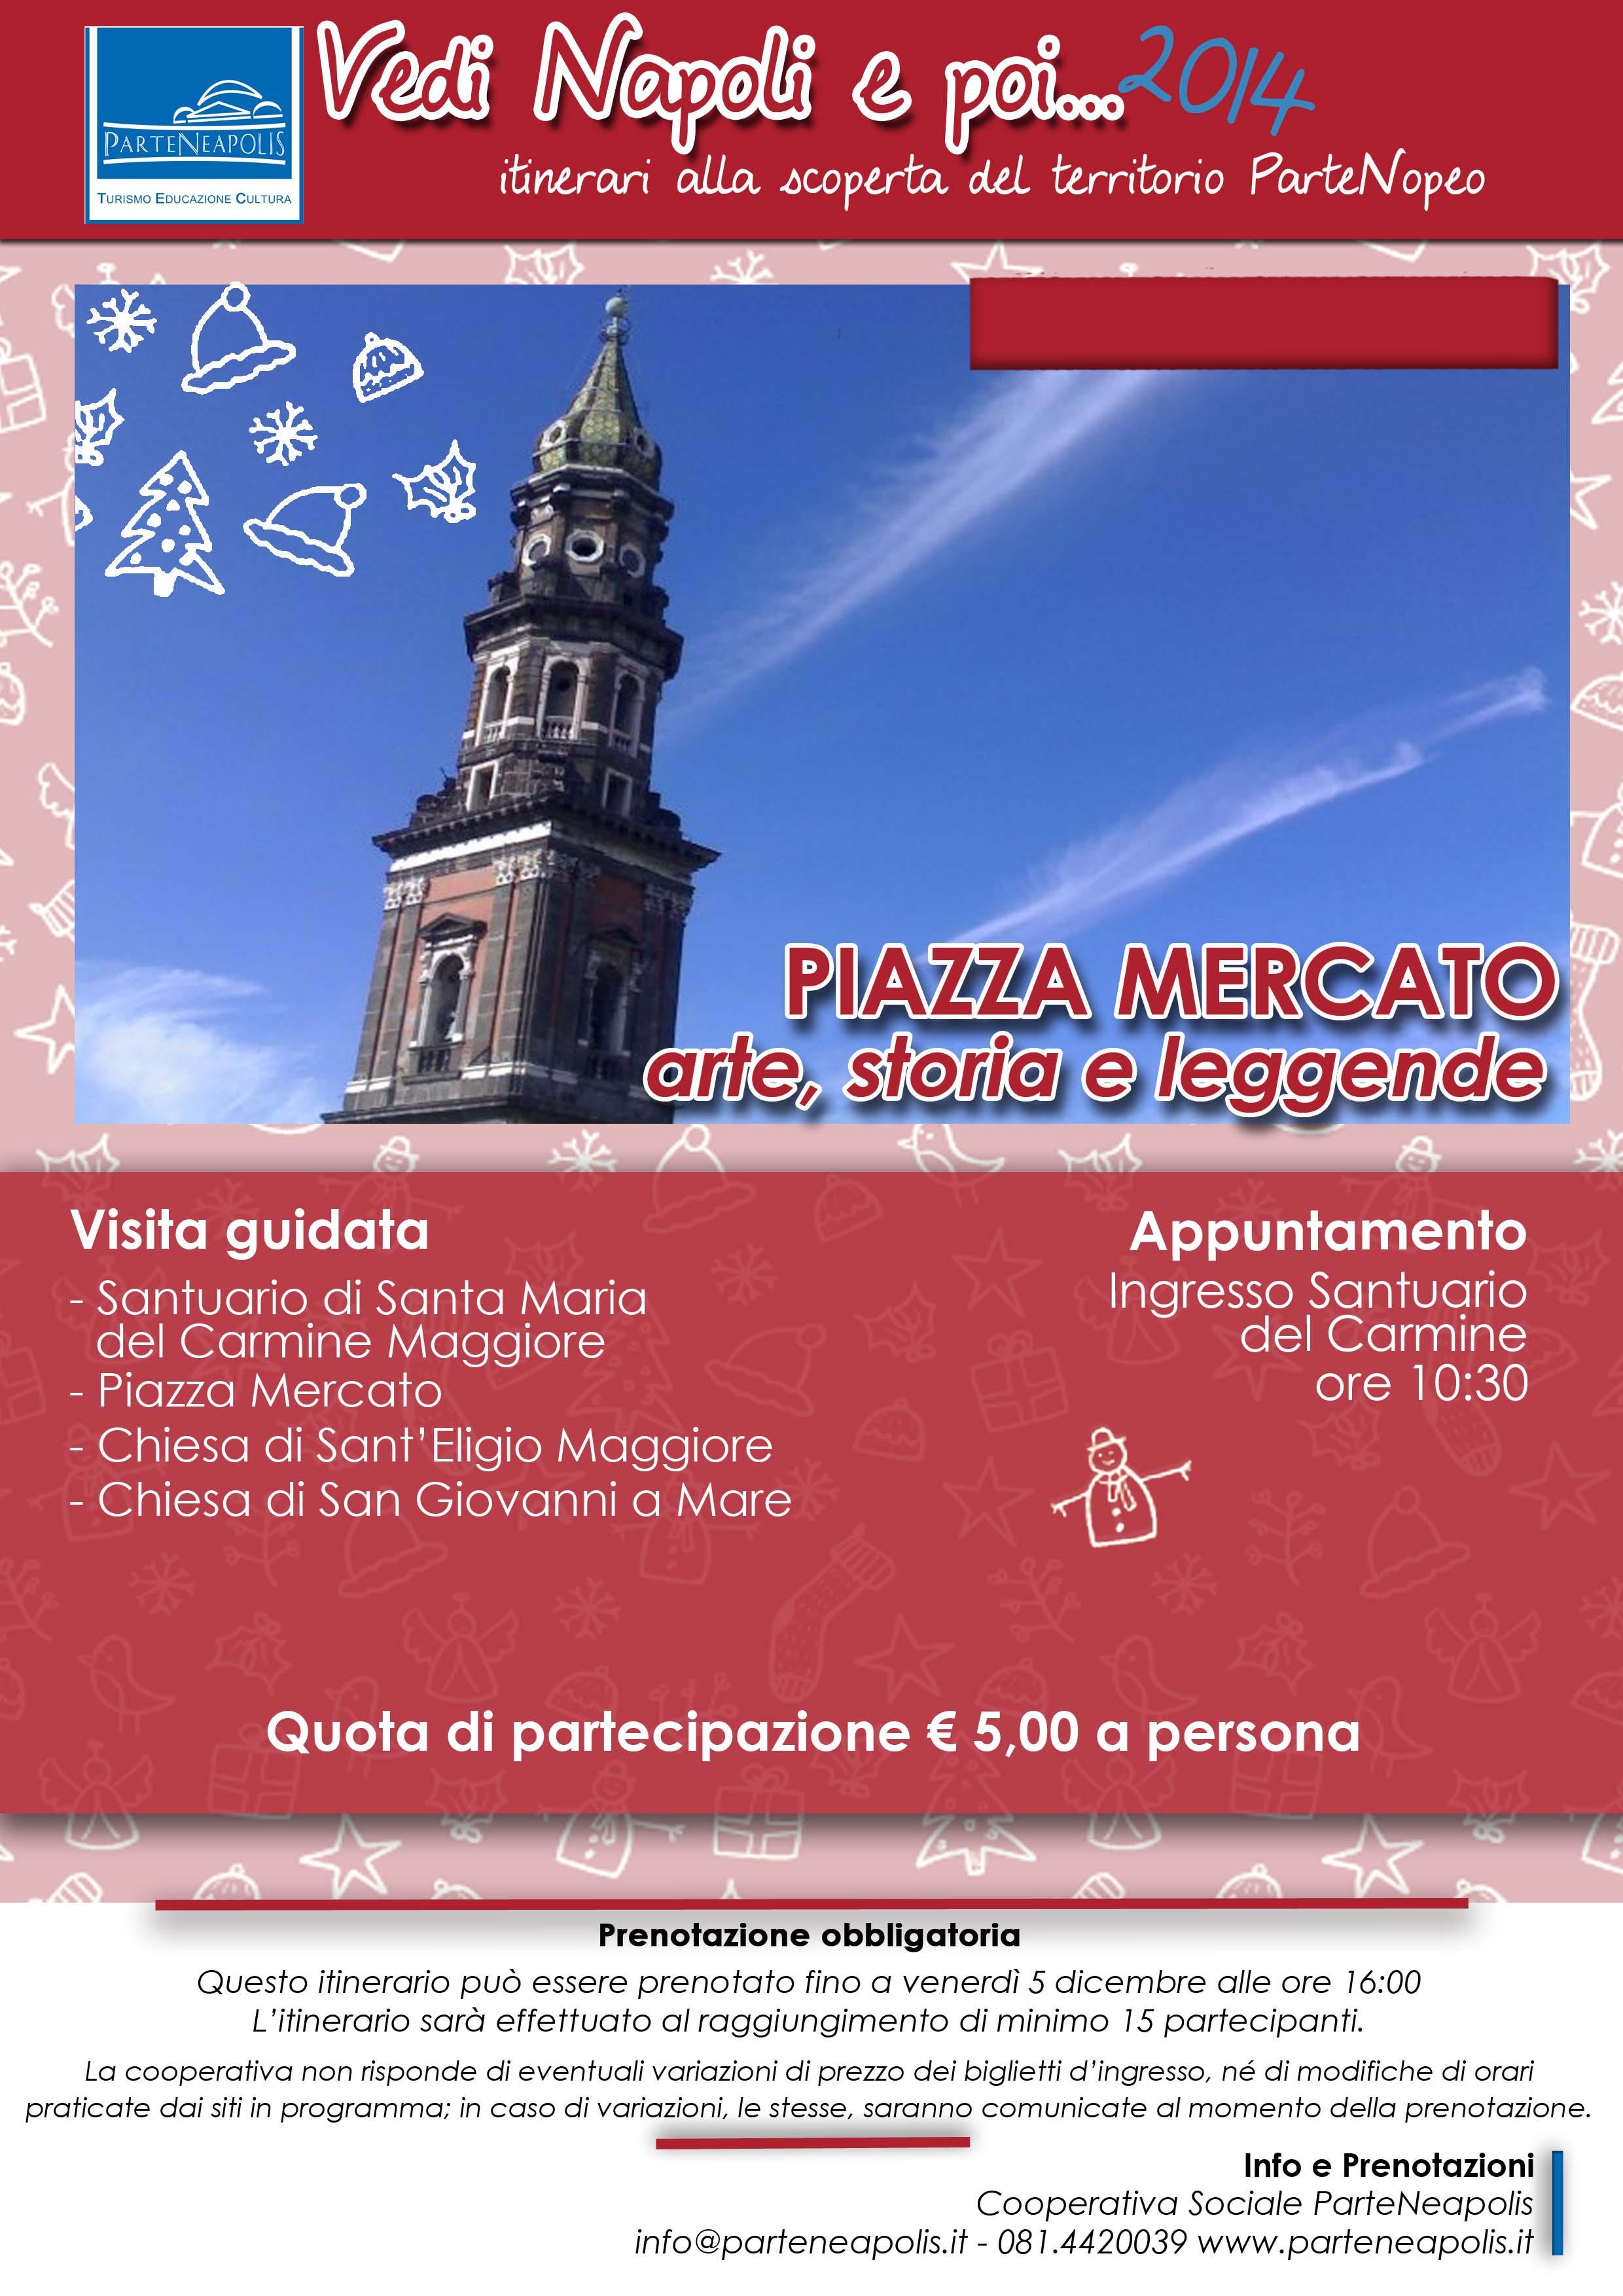 Piazza Mercato - arte, storia e leggende